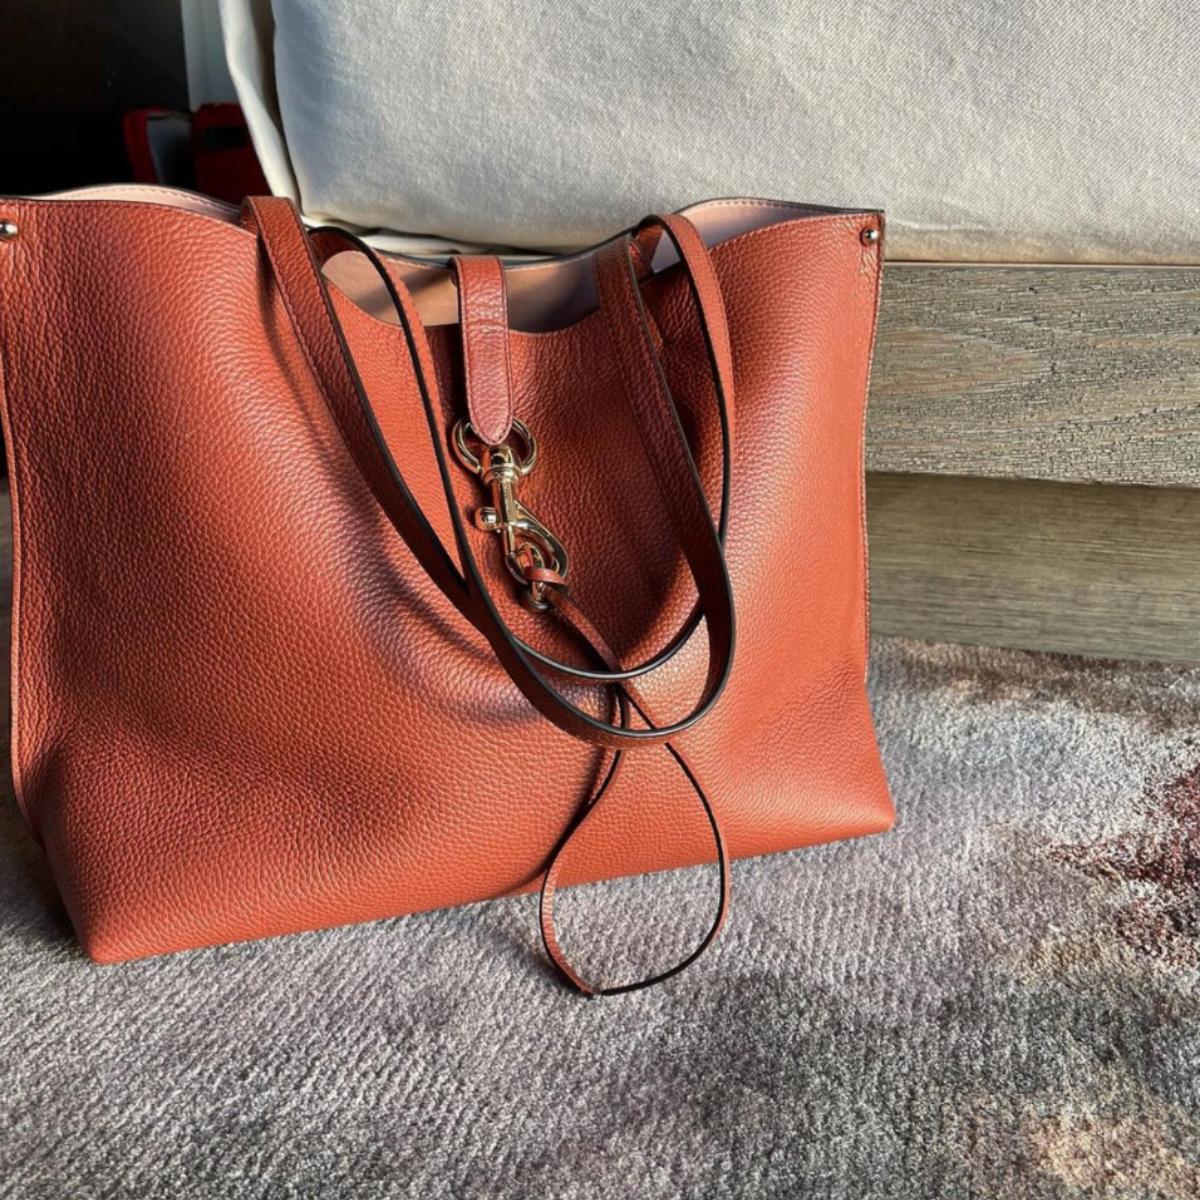 Rebecca Minkoff brown tote bag